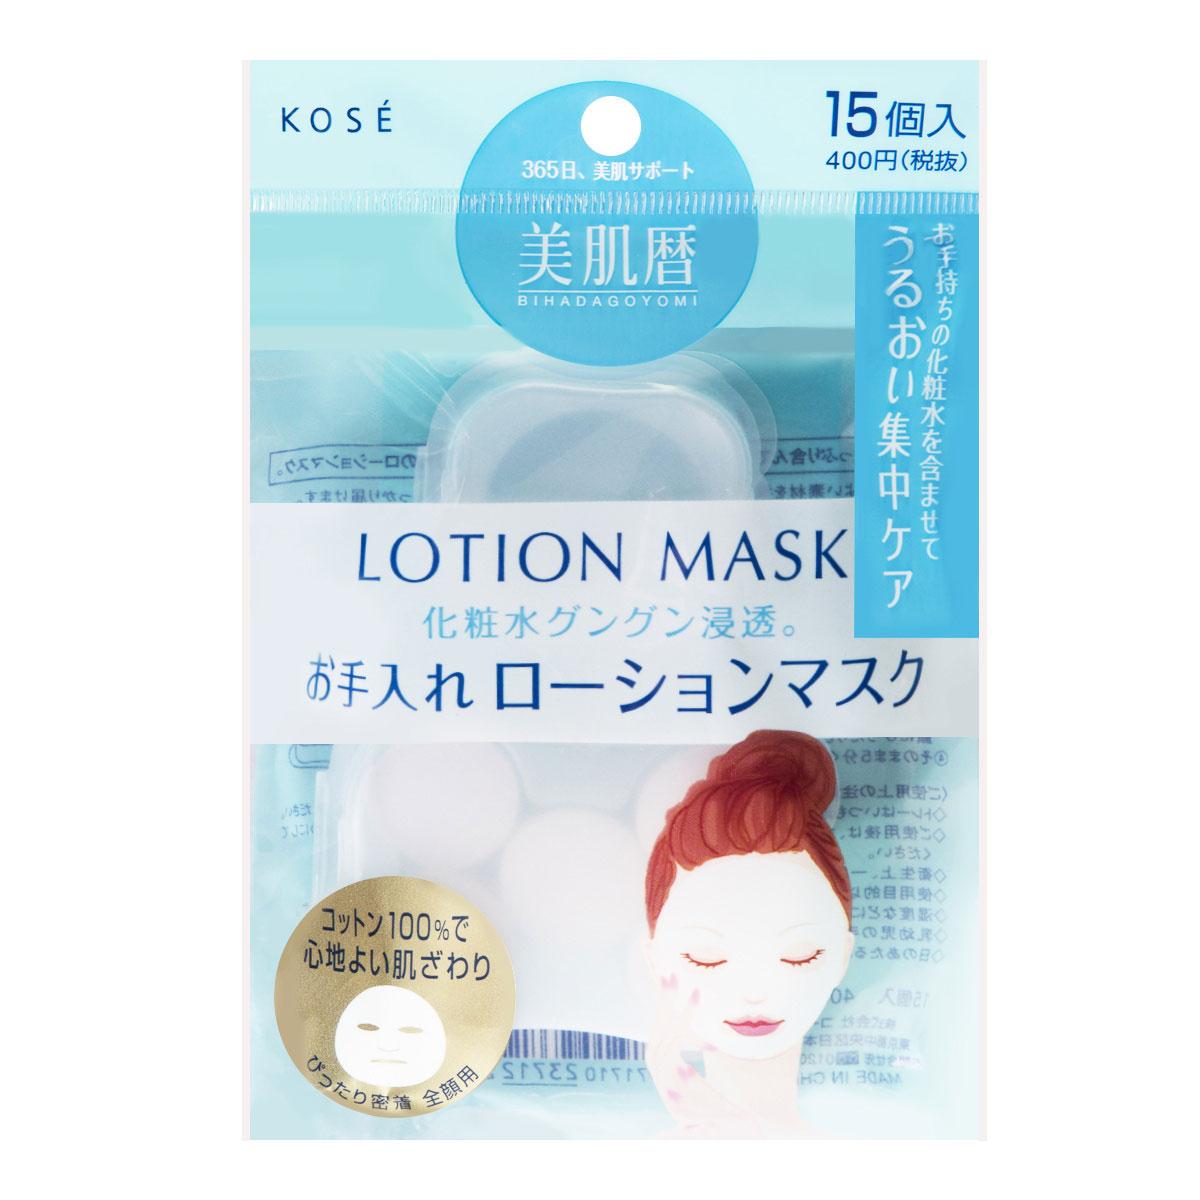 Kose Lotion Mask (15 pcs)